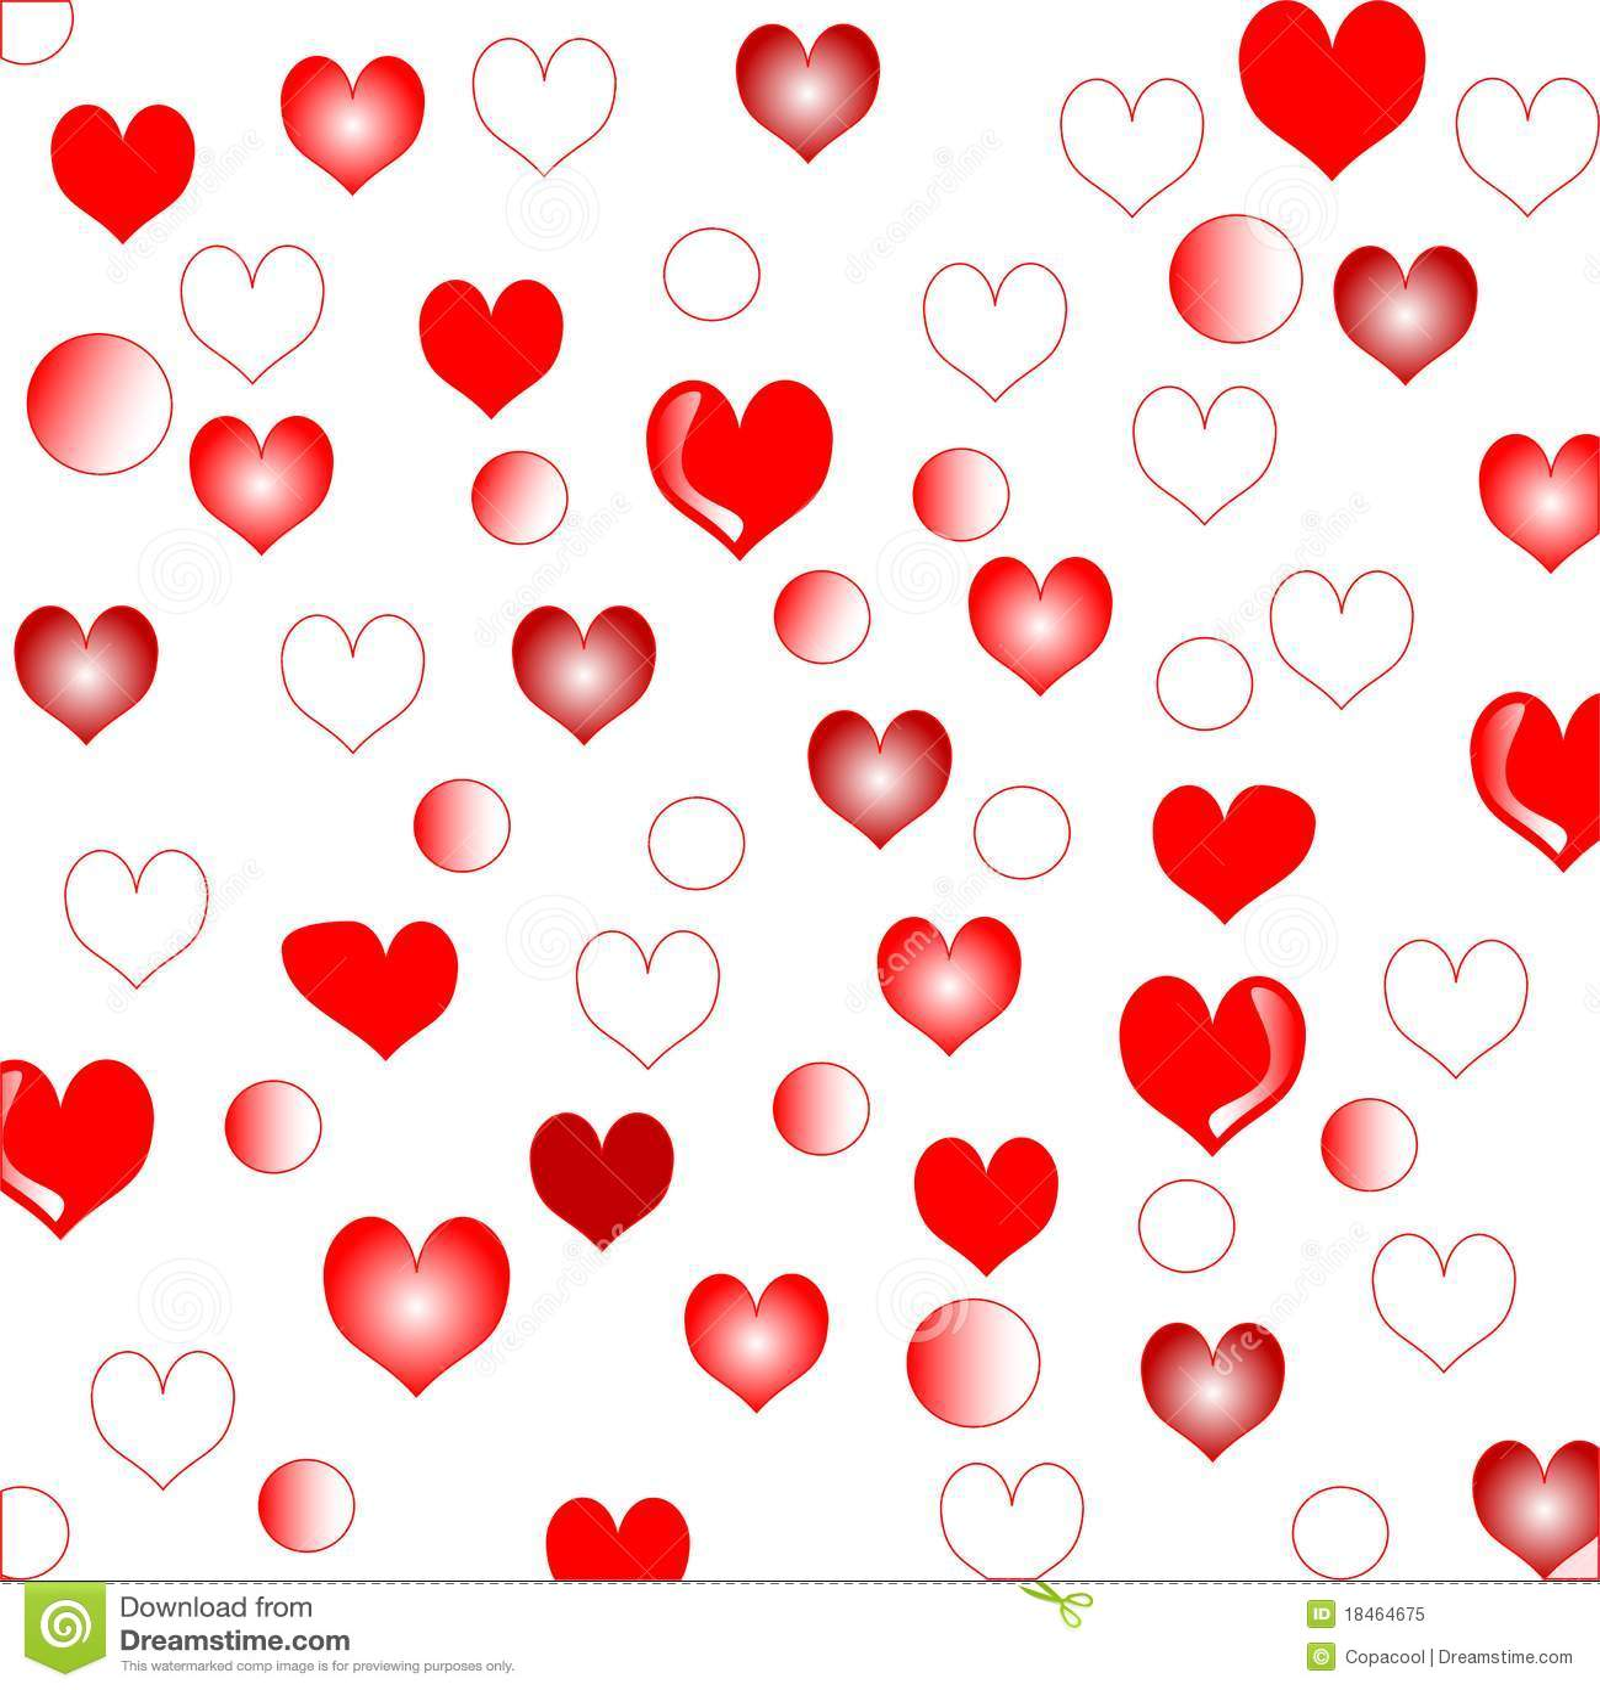 Wedding Love Hearts Background Stock Vector  Illustration. Supergirl Wedding Rings. Cinderella Engagement Rings. Malayali Wedding Rings. Parade Rings. Gemini Birthstone Wedding Rings. Septum Rings. Taken Rings. Star Wars Rings